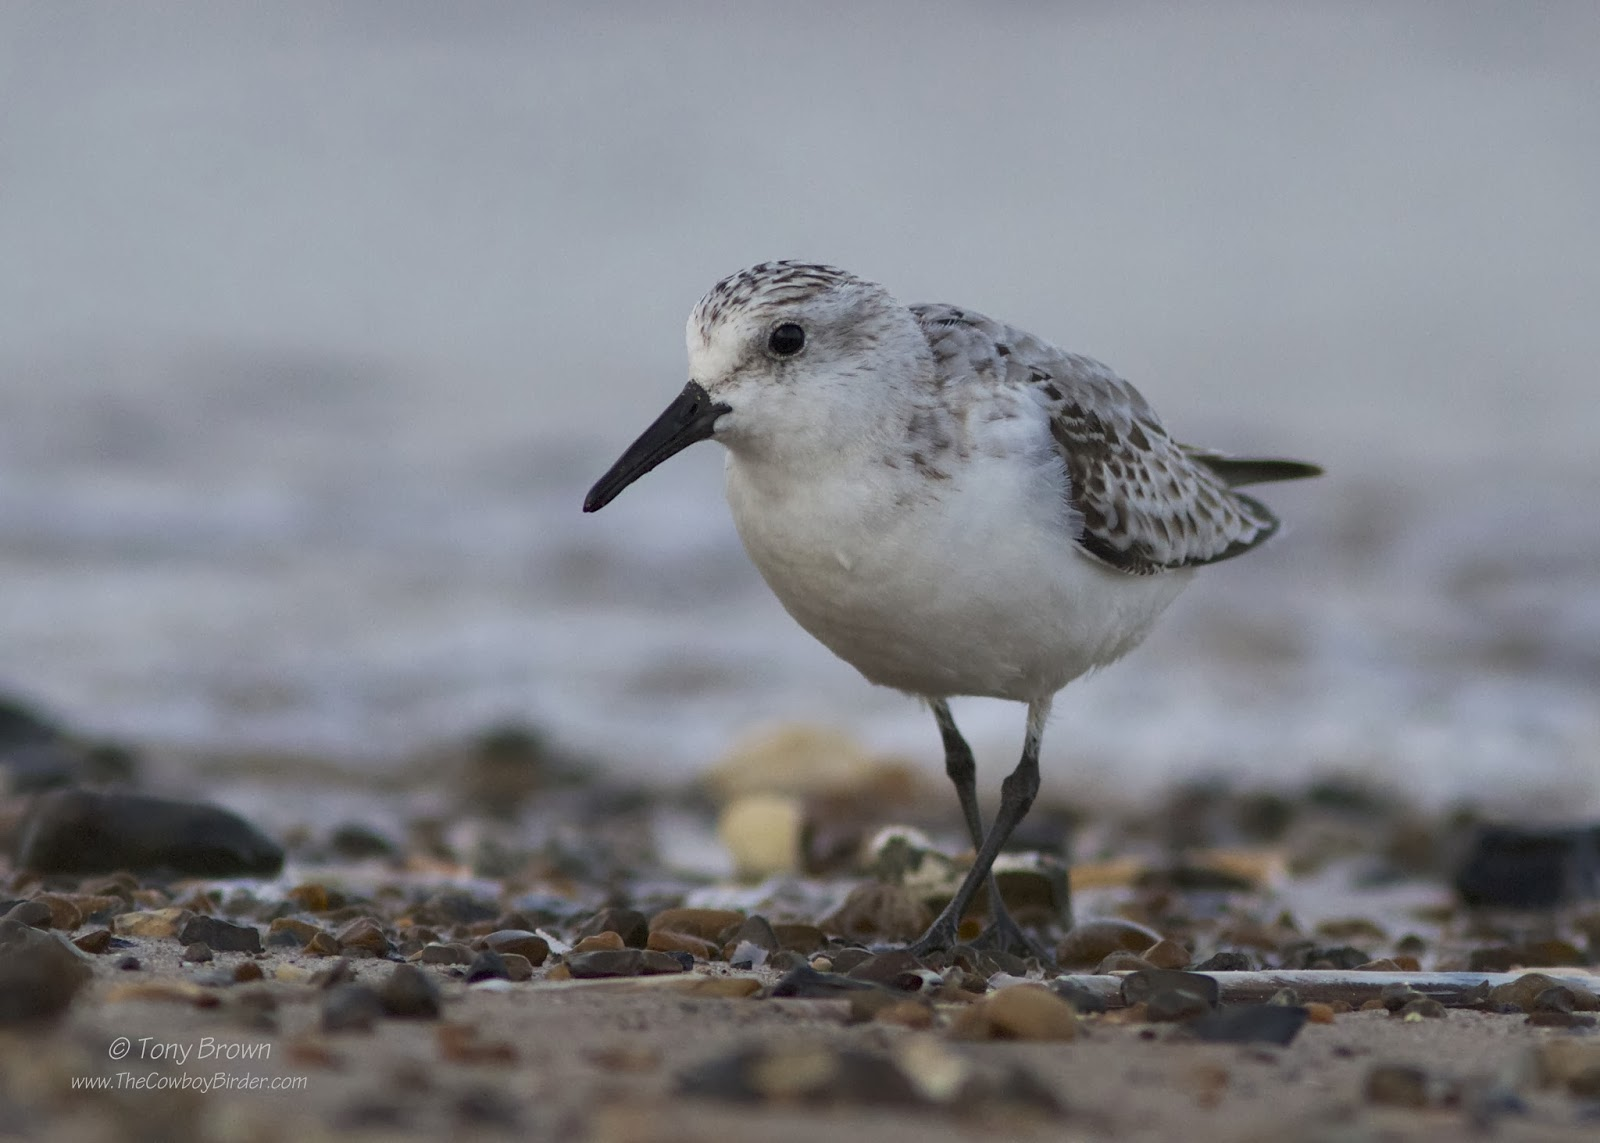 Winter plumage, Norfolk, Wader